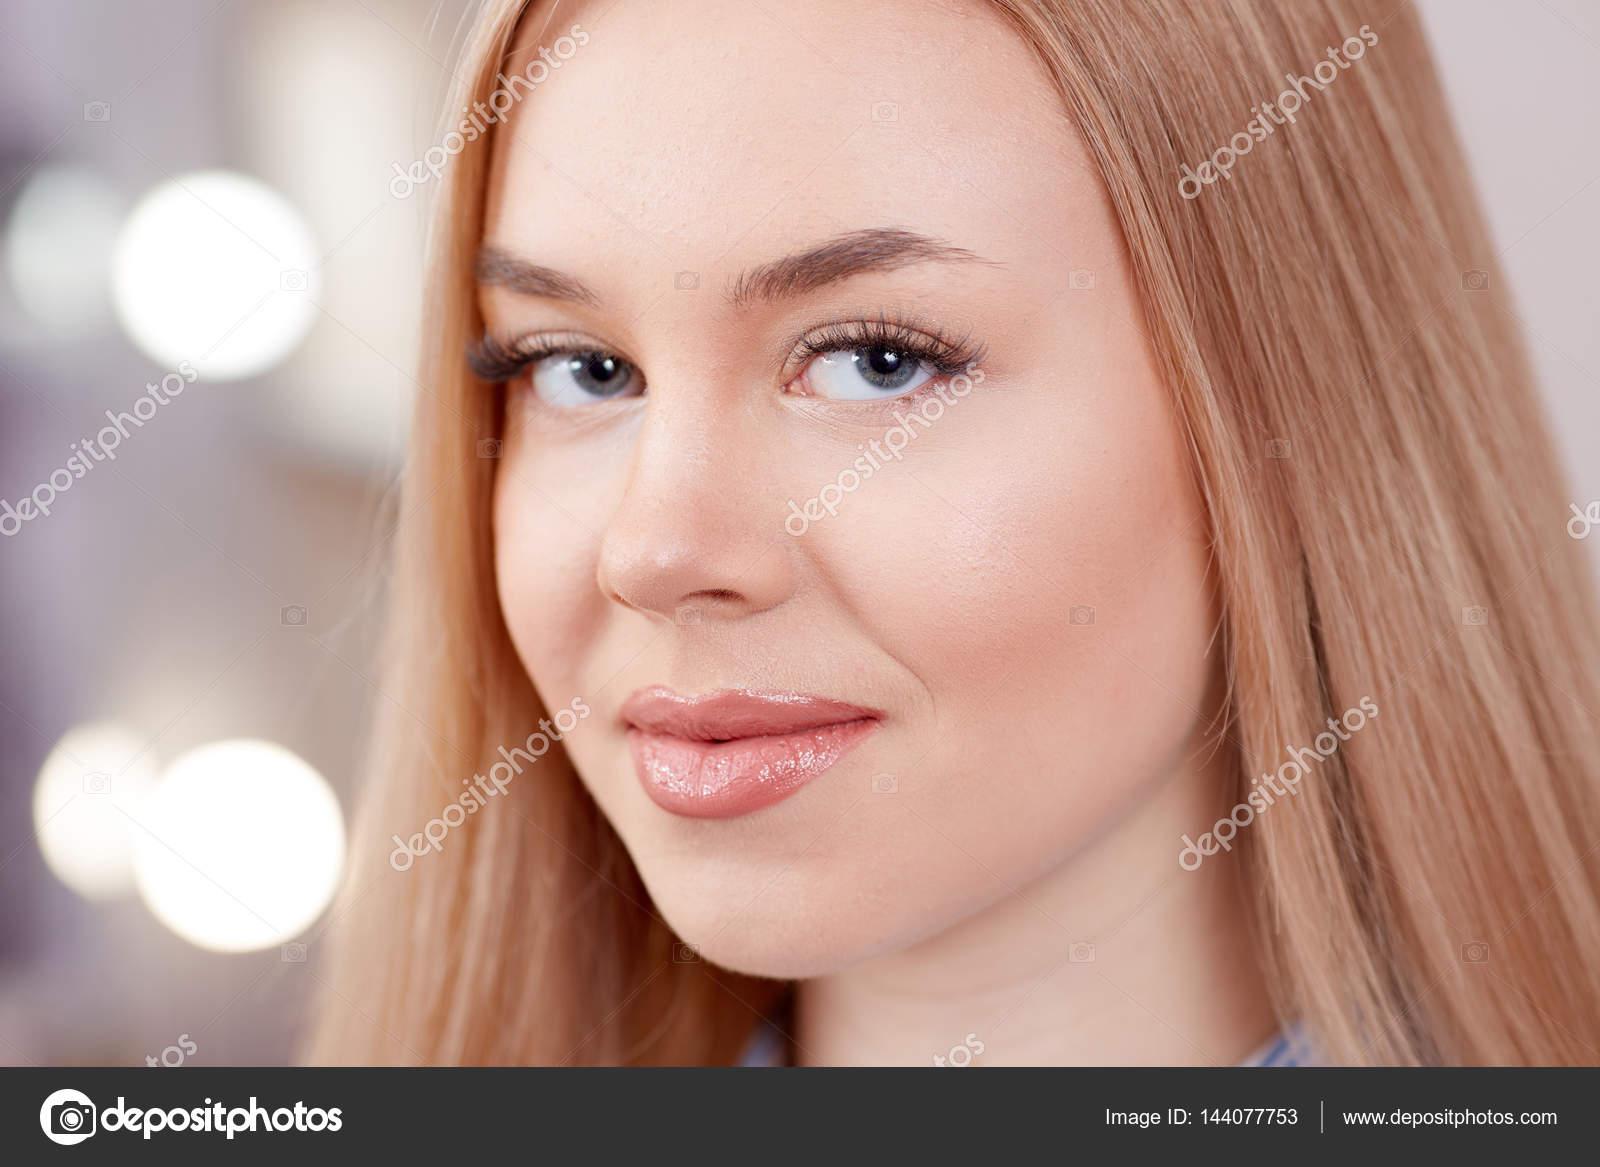 blondine mit gef hllosen augenbrauen permanent make up. Black Bedroom Furniture Sets. Home Design Ideas